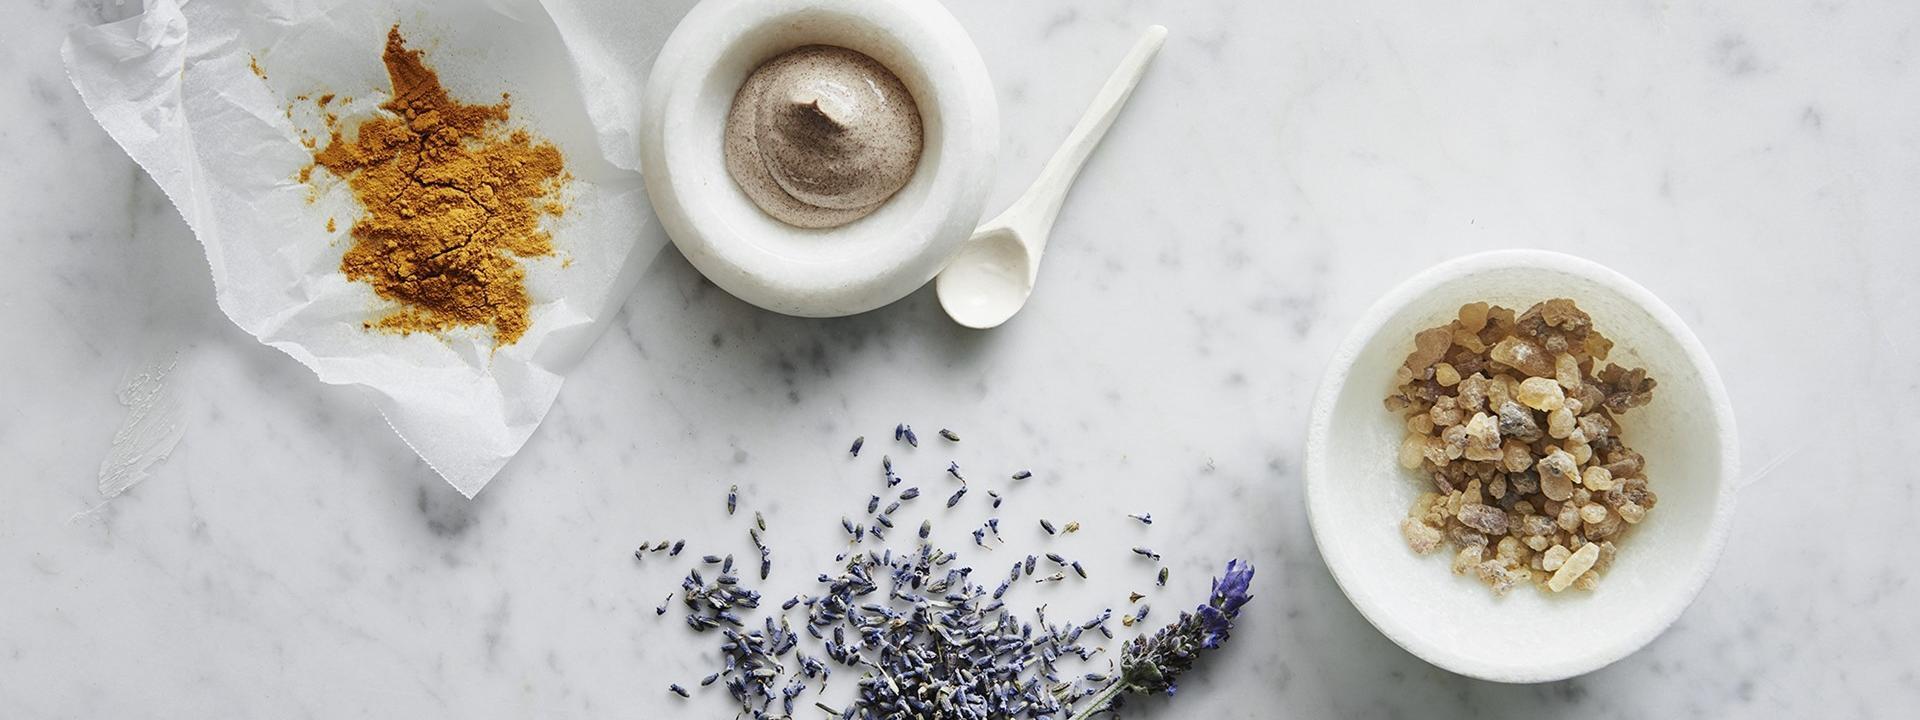 Medicines using in crown spa at Crown Hotels